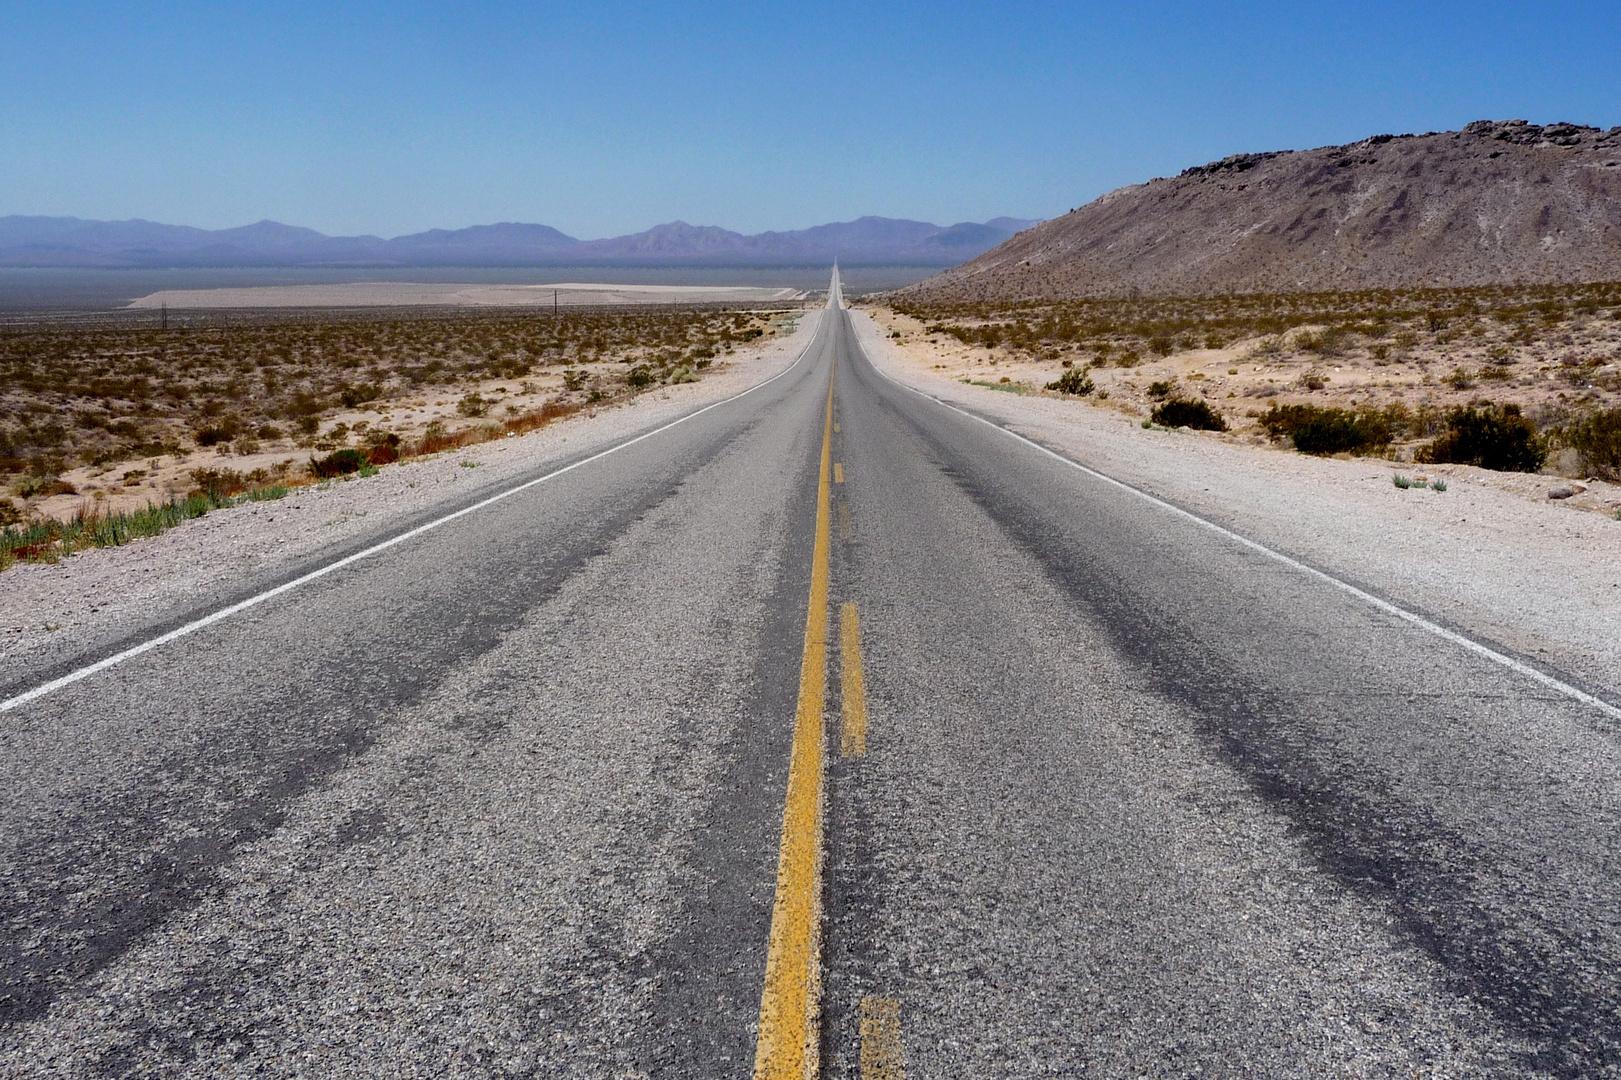 Death Valley - 11 miles straight on